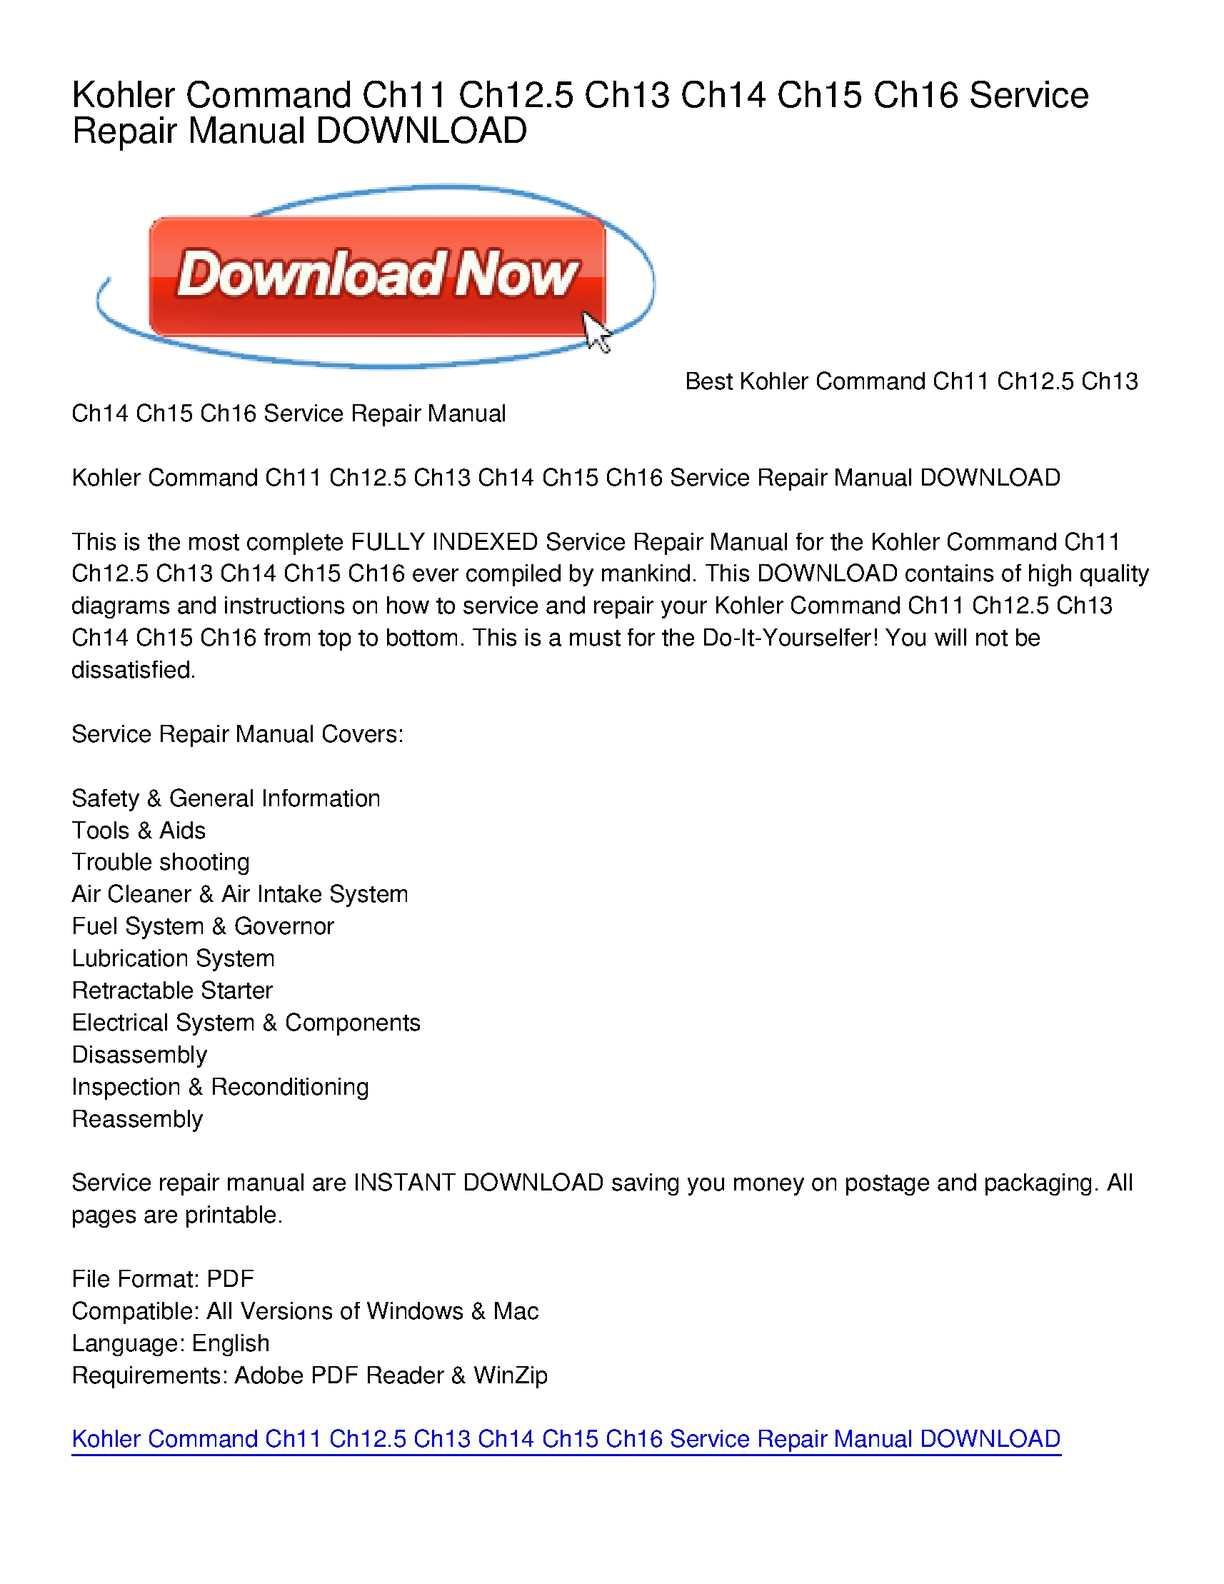 Calaméo - Kohler Command Ch11 Ch12.5 Ch13 Ch14 Ch15 Ch16 Service Repair  Manual DOWNLOAD